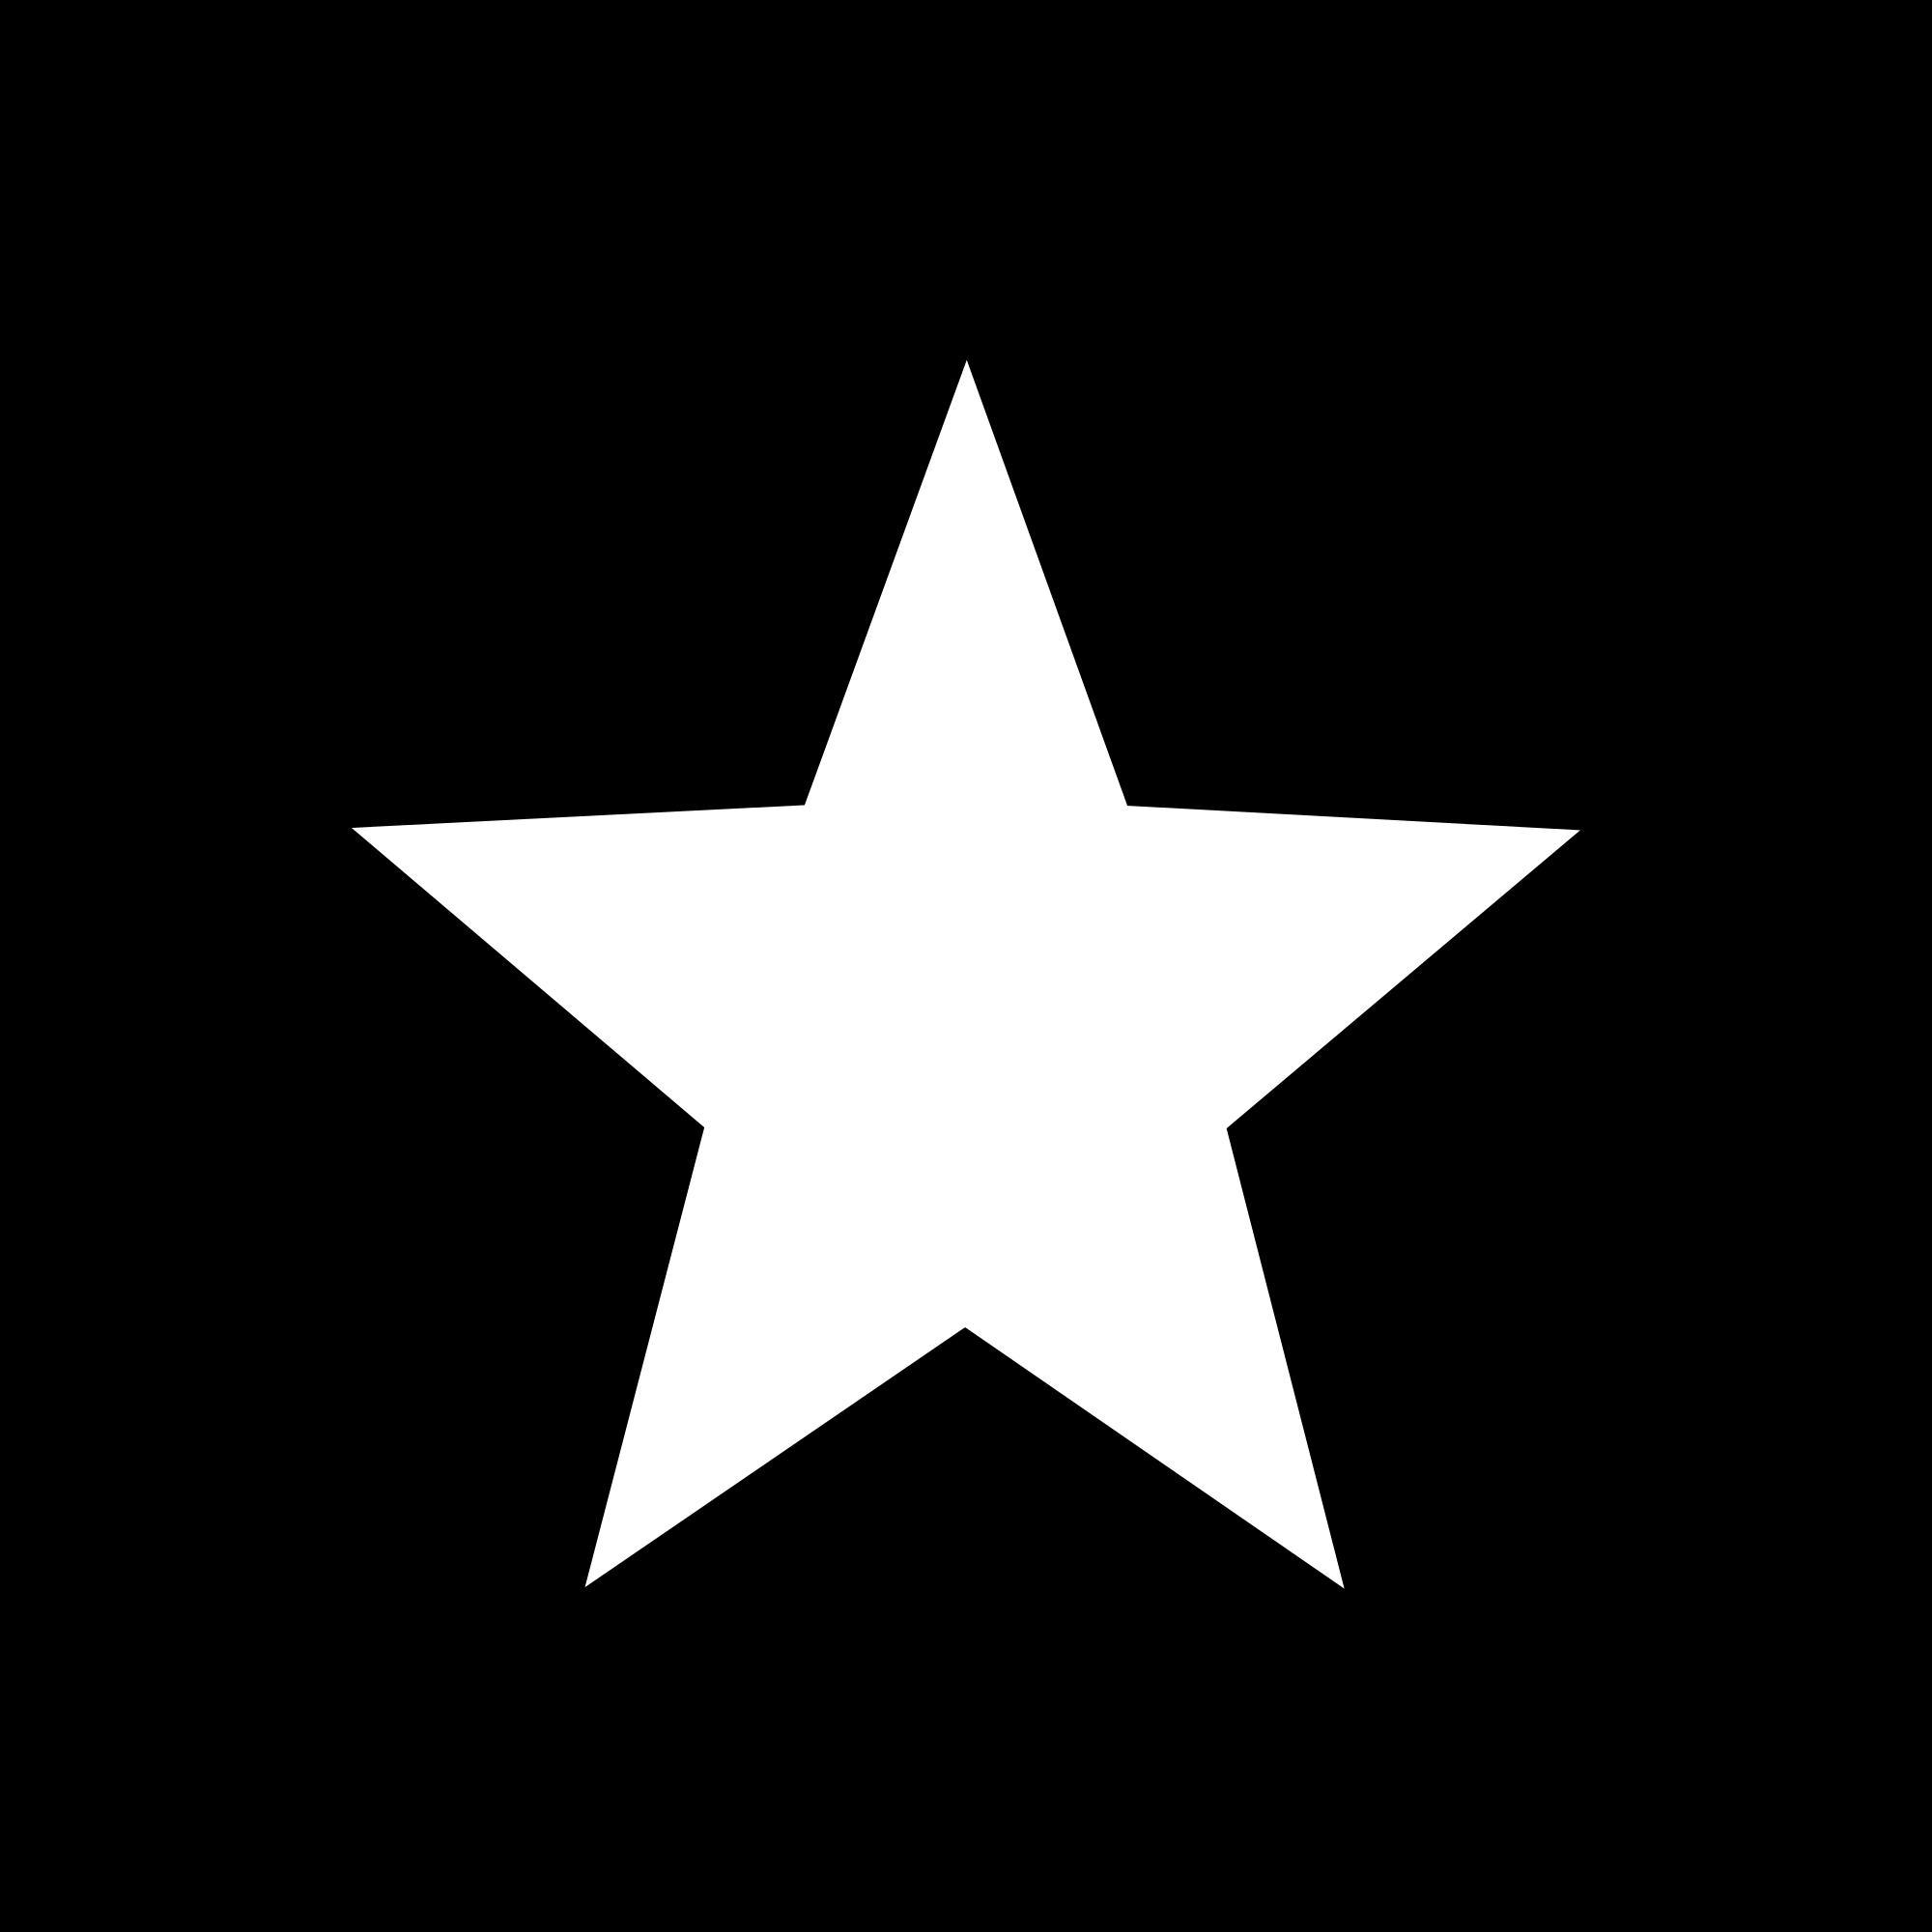 white star no background clipart best Nautical Anchor Clip Art nautical border clip art free